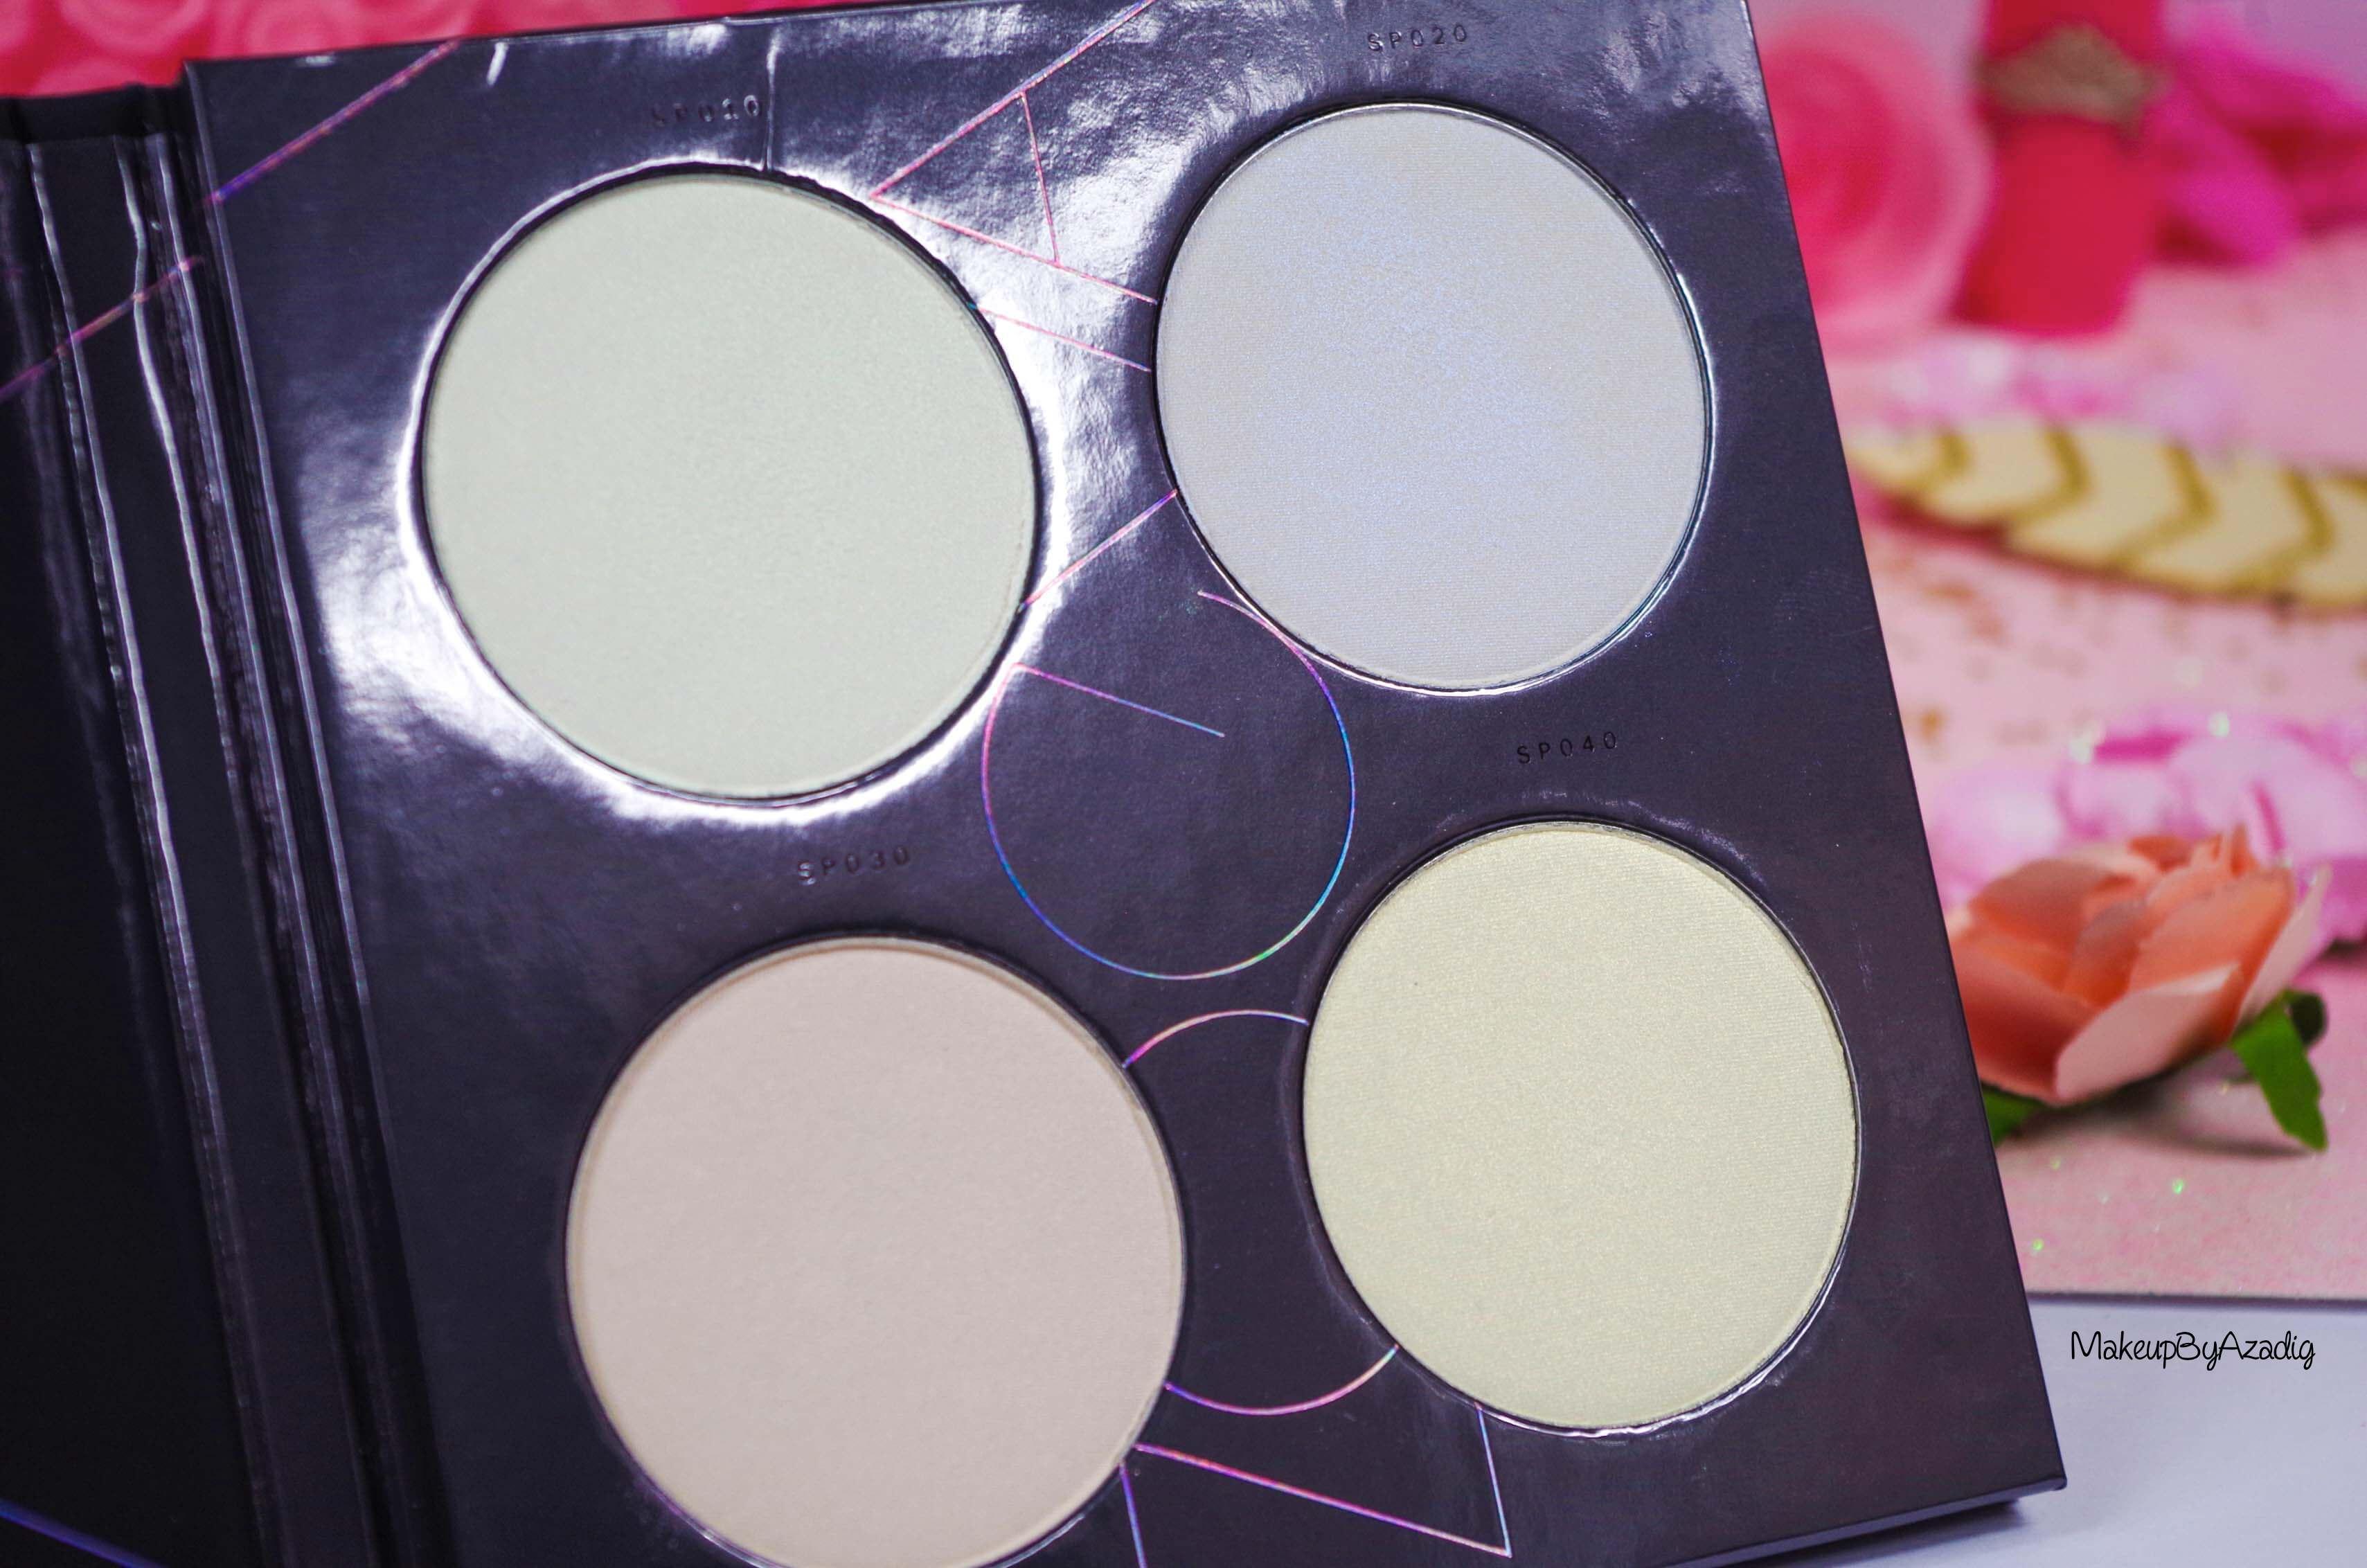 palette-highlighter-enlumineur-pas-cher-spring-strobe-spectrum-zoeva-sephora-arcenciel-licorne-makeupbyazadig-revue-avis-prix-green